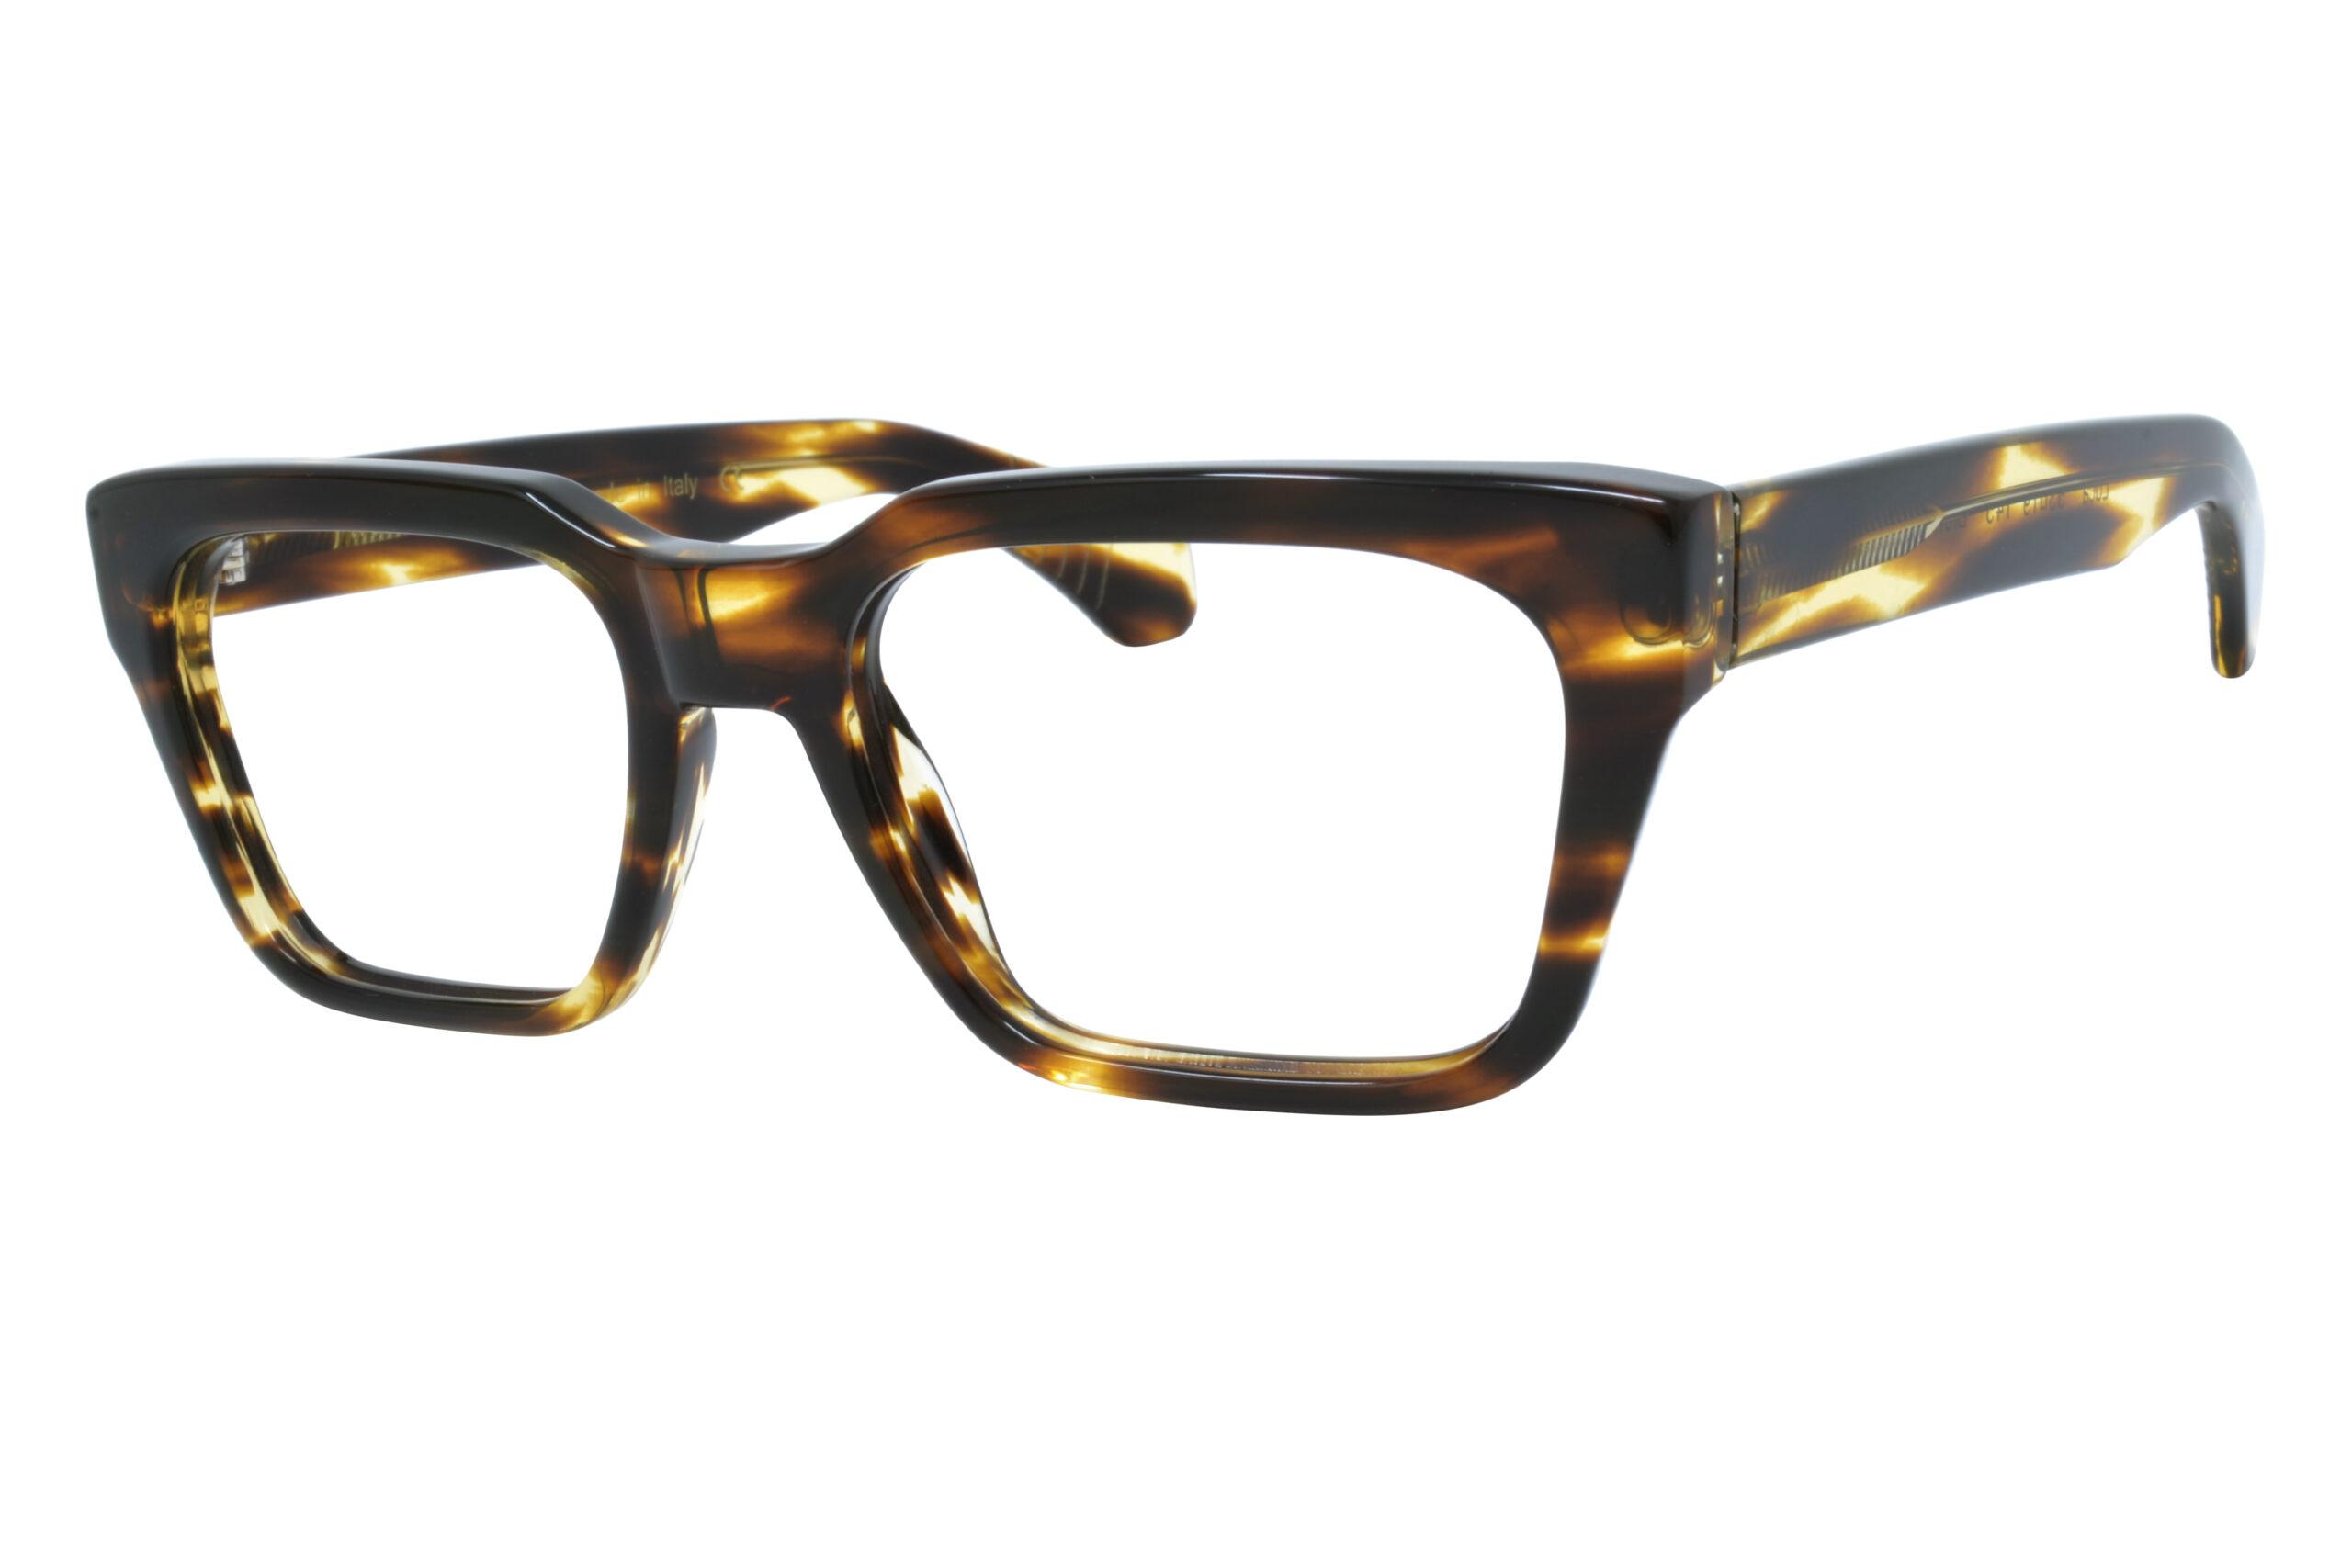 Dolabany Eyewear Firenze Occhiali Luca Brown Dusk